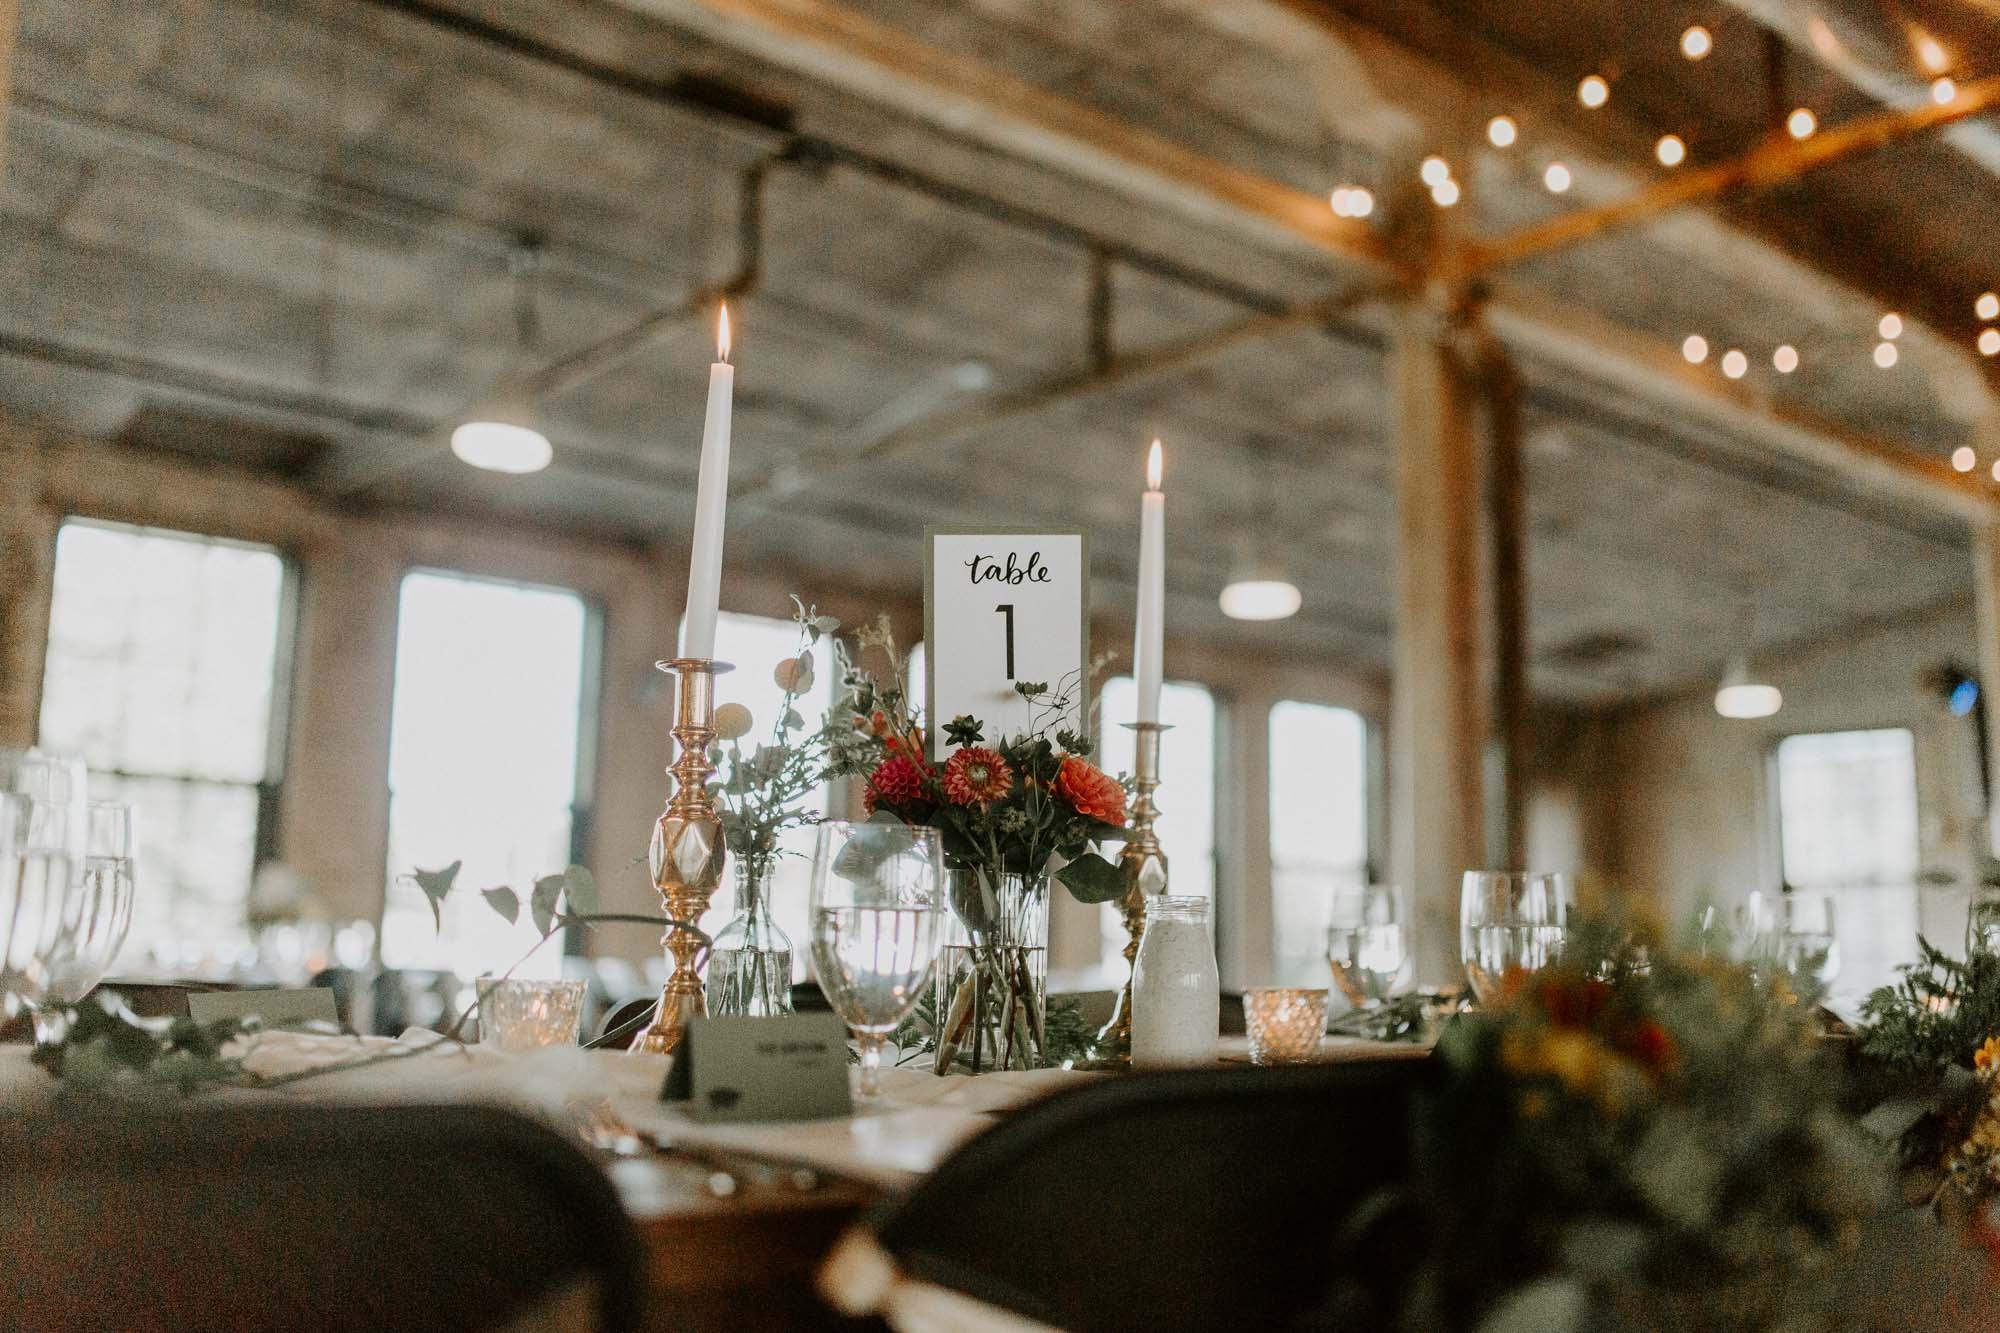 journeyman_distillery_wedding_photographer_chicago_il_wright_photographs-4177.jpg